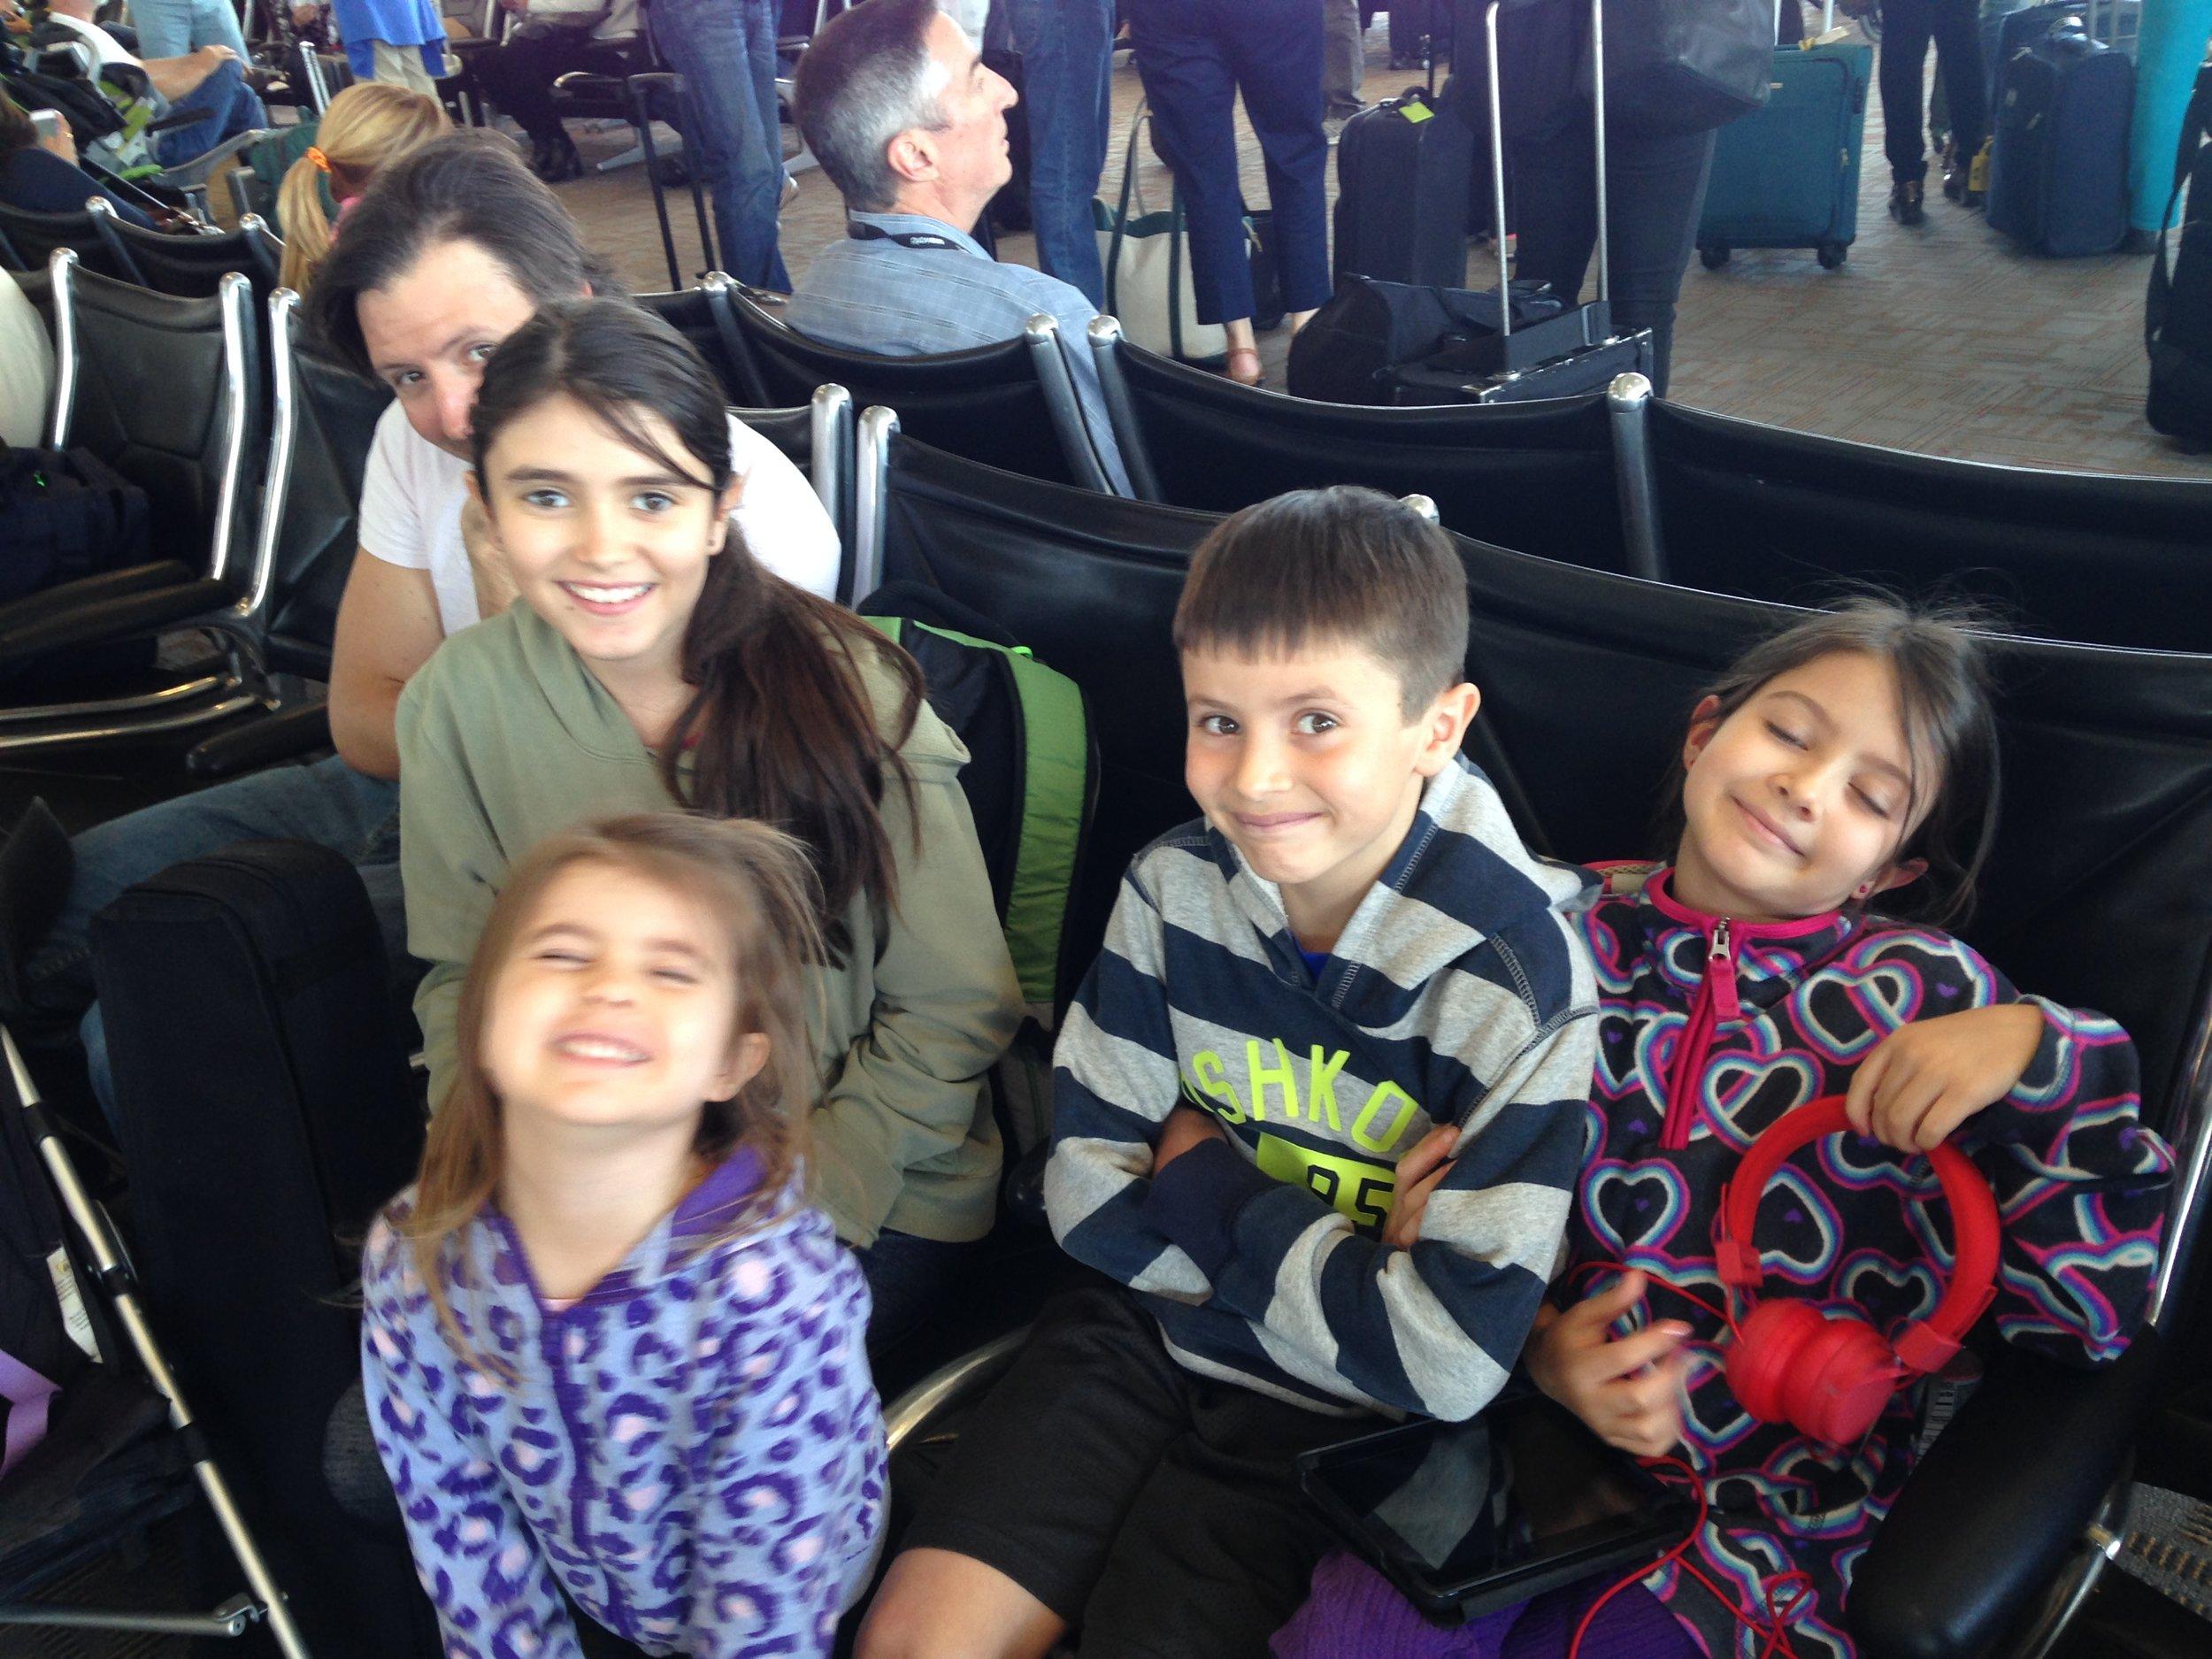 Boarding for first El Salvador flight. Back when we were in the dark. (Miami, FL; Apr 2015)